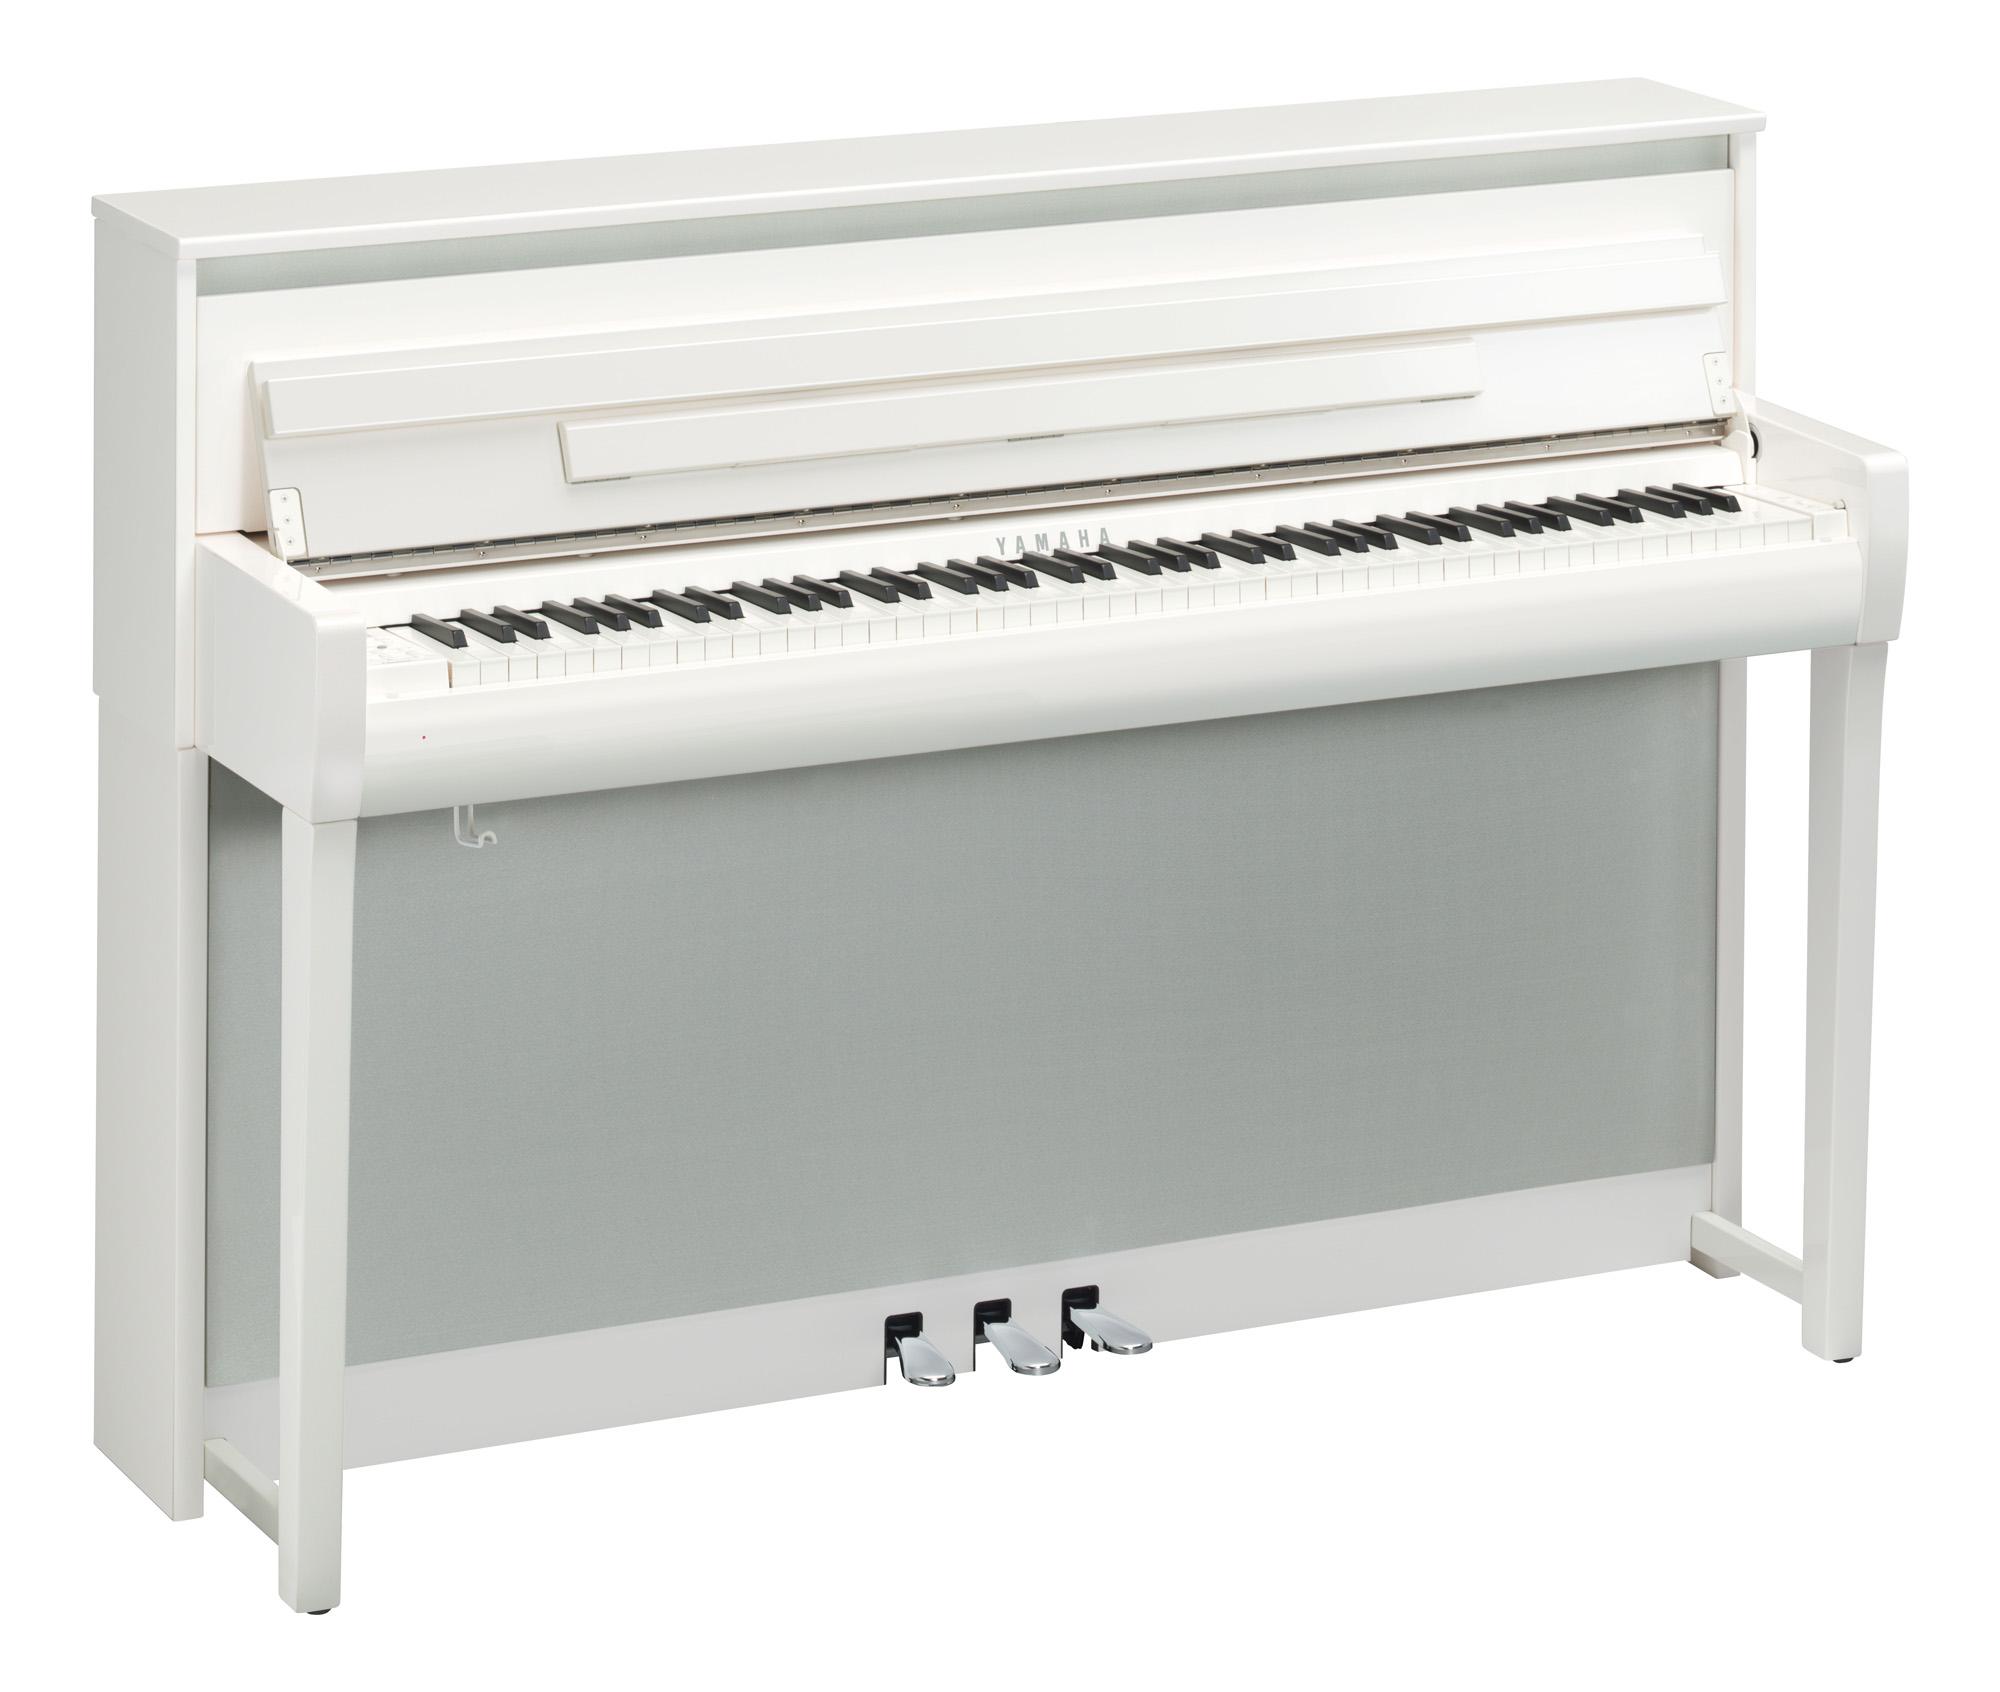 Yamaha Clp 685 Clavinova Digital Piano In Polished White